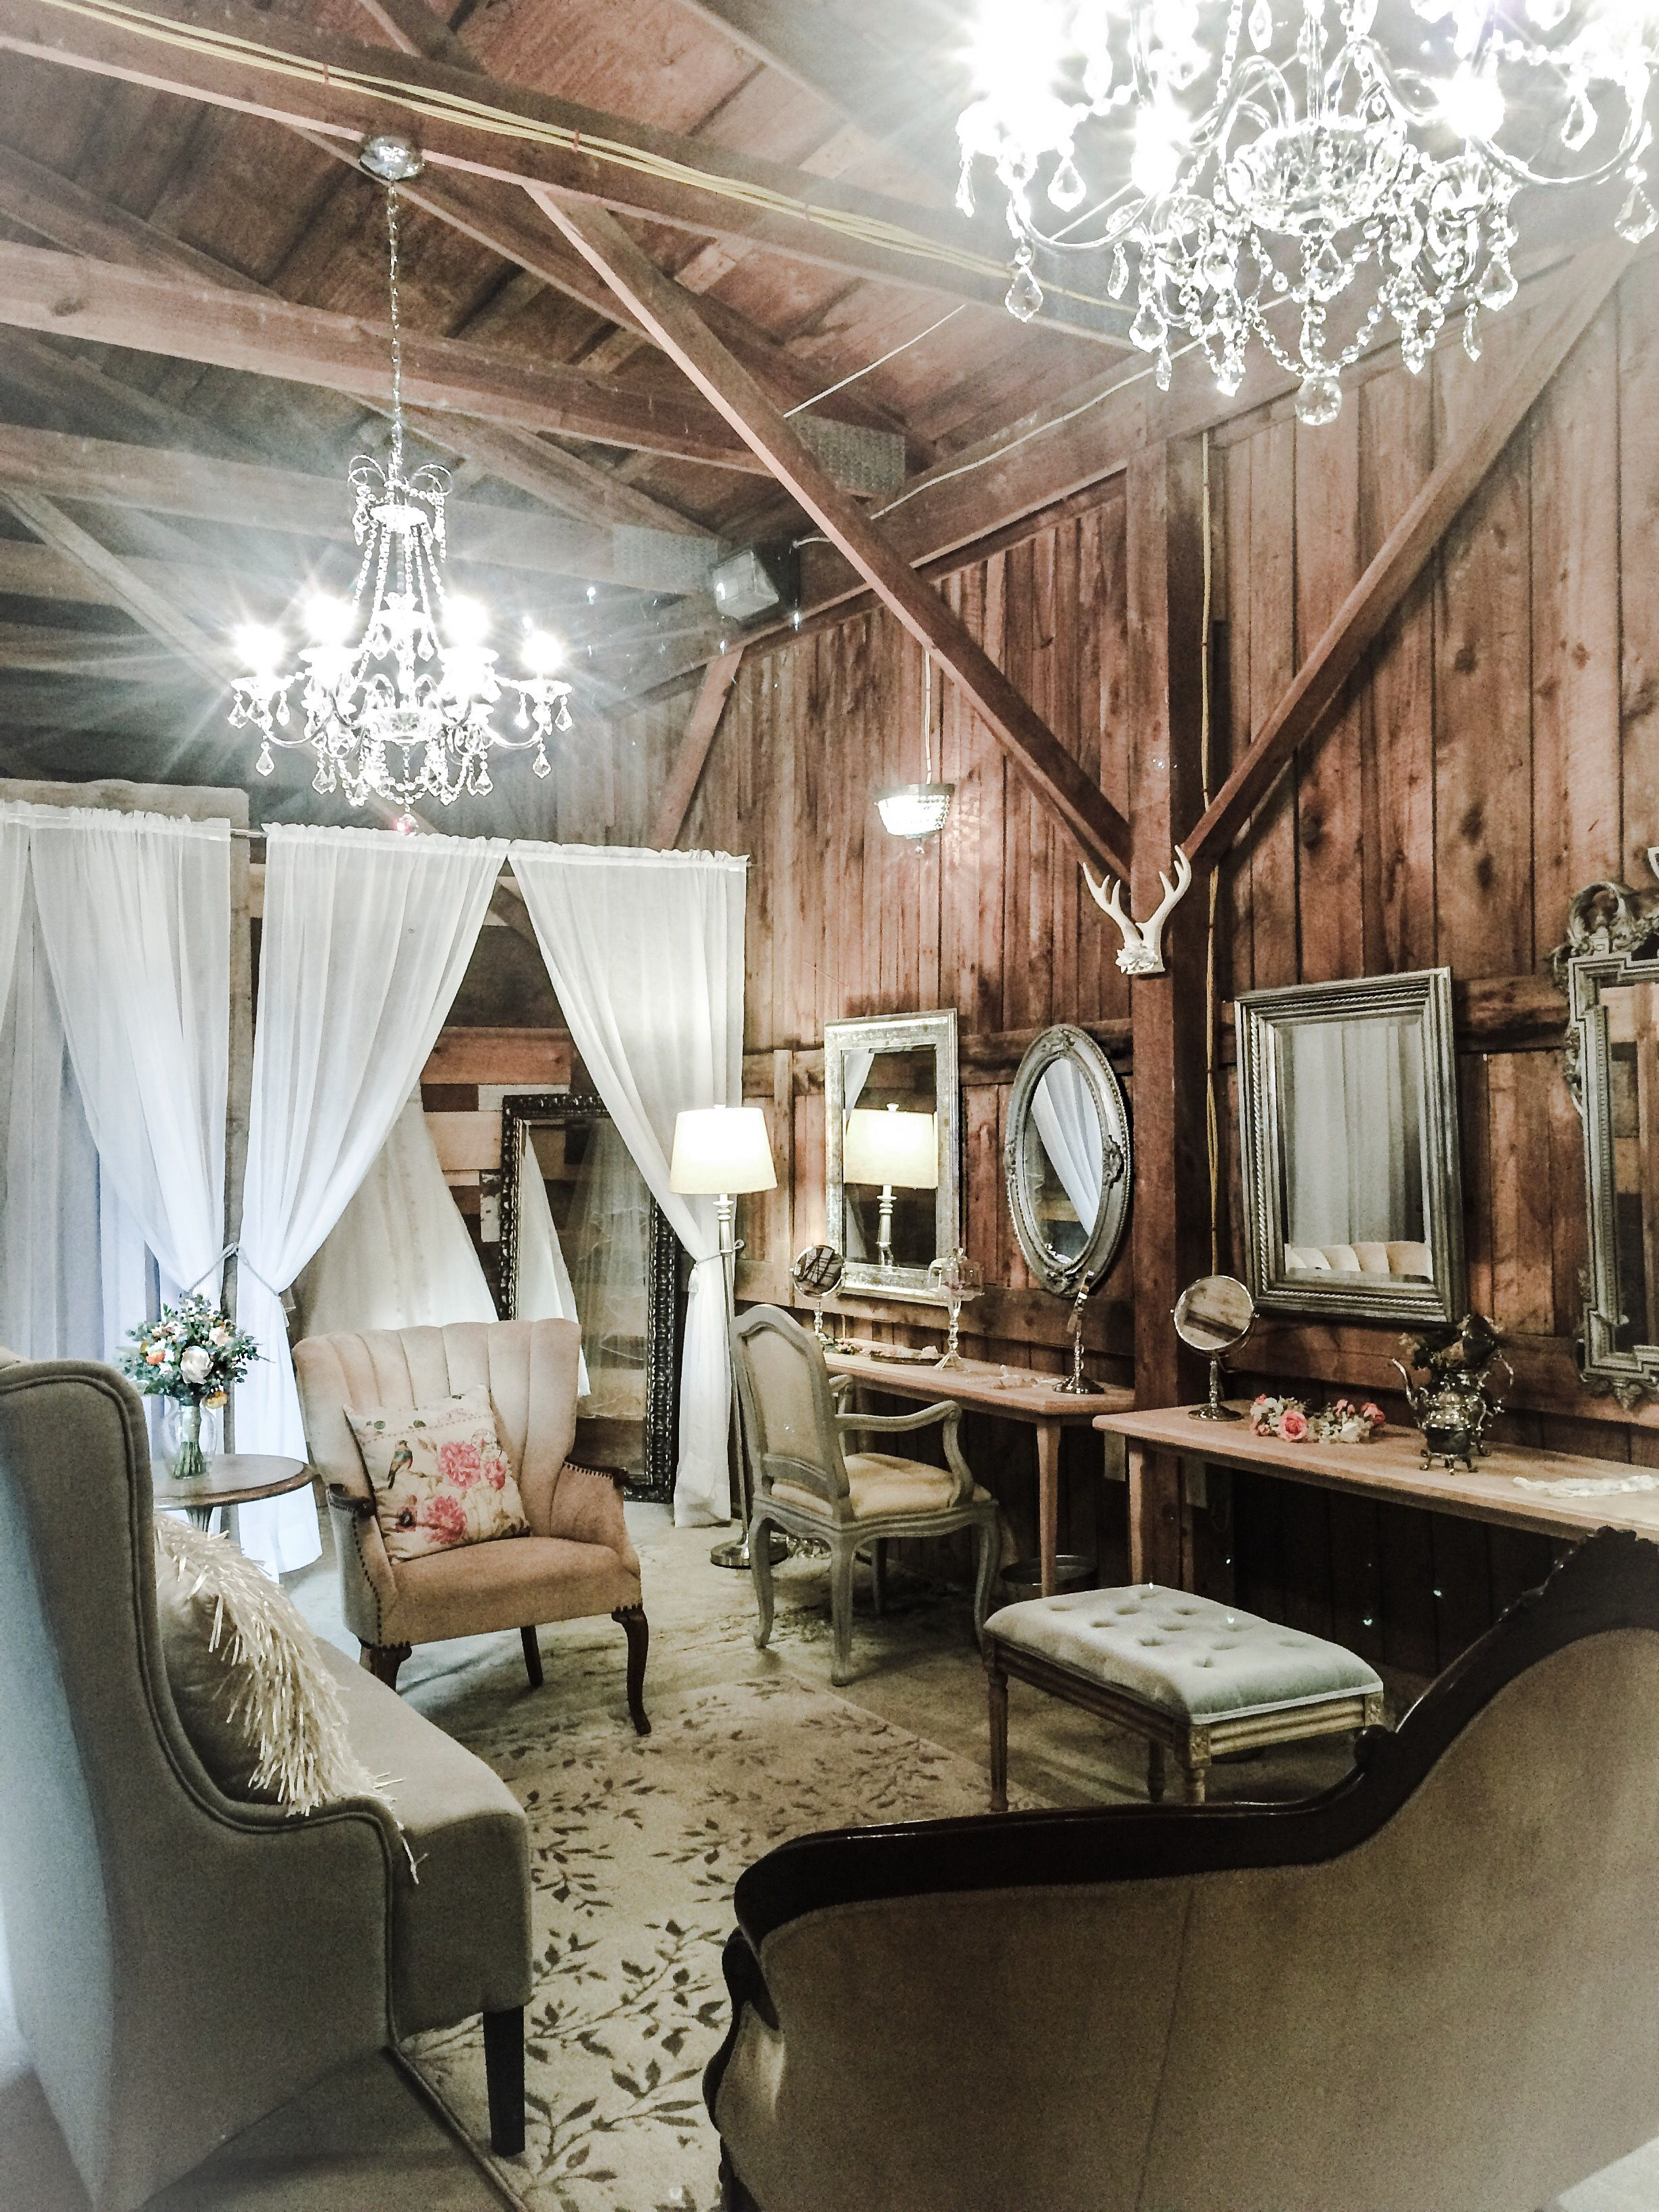 Bridal suite at The Barn at Silver